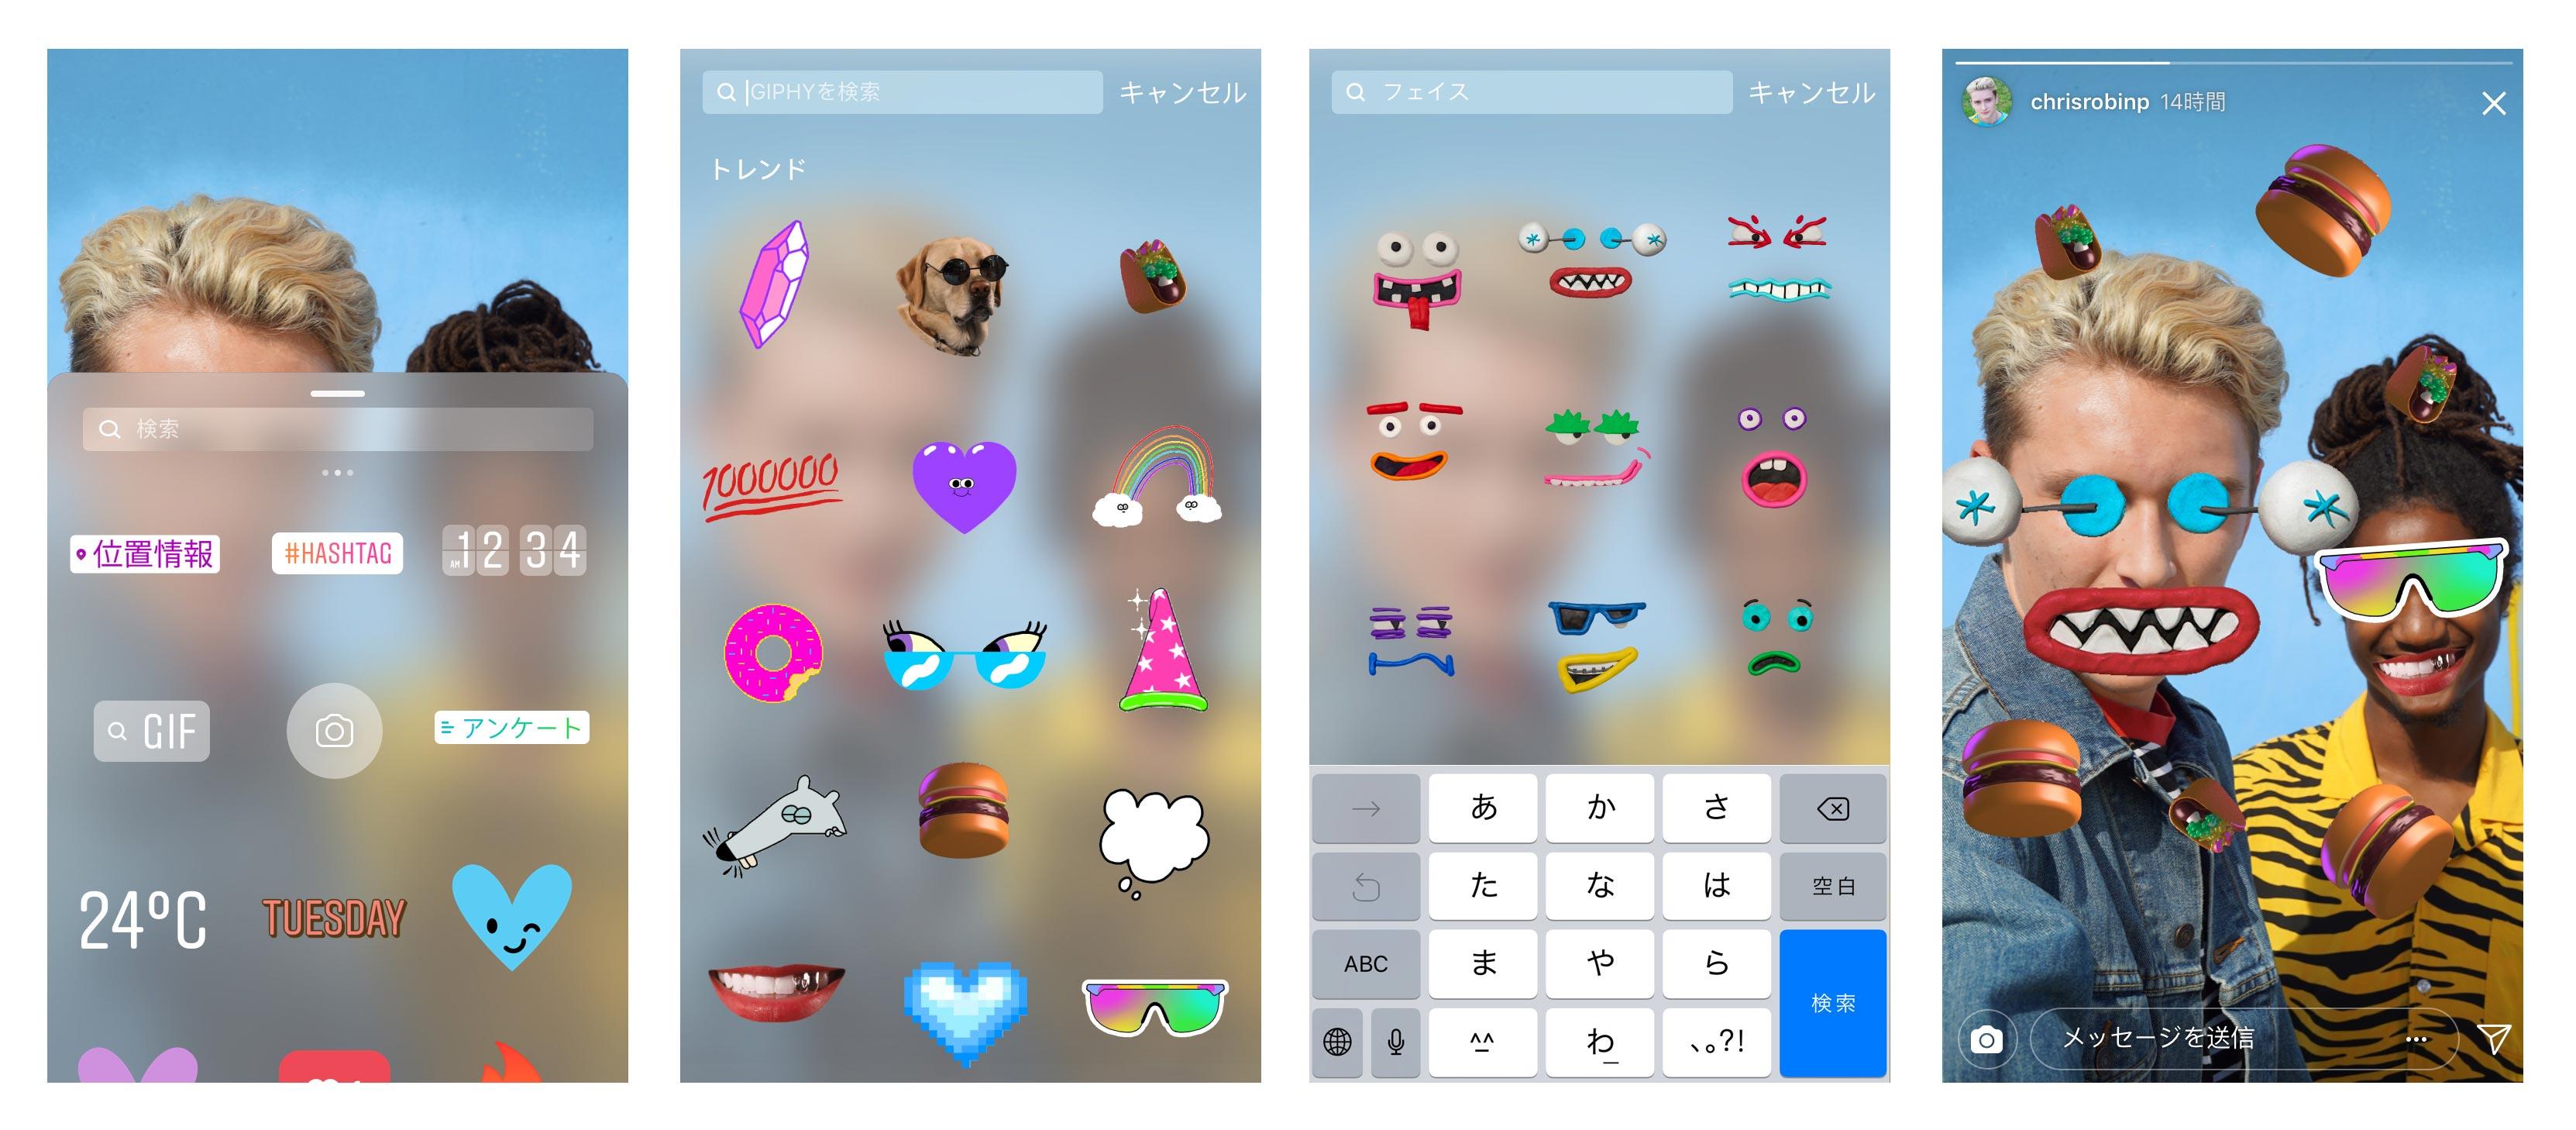 Instagram、ストーリーズにGIFスタンプを追加可能に ― 今後画像サイズの変更も可能に